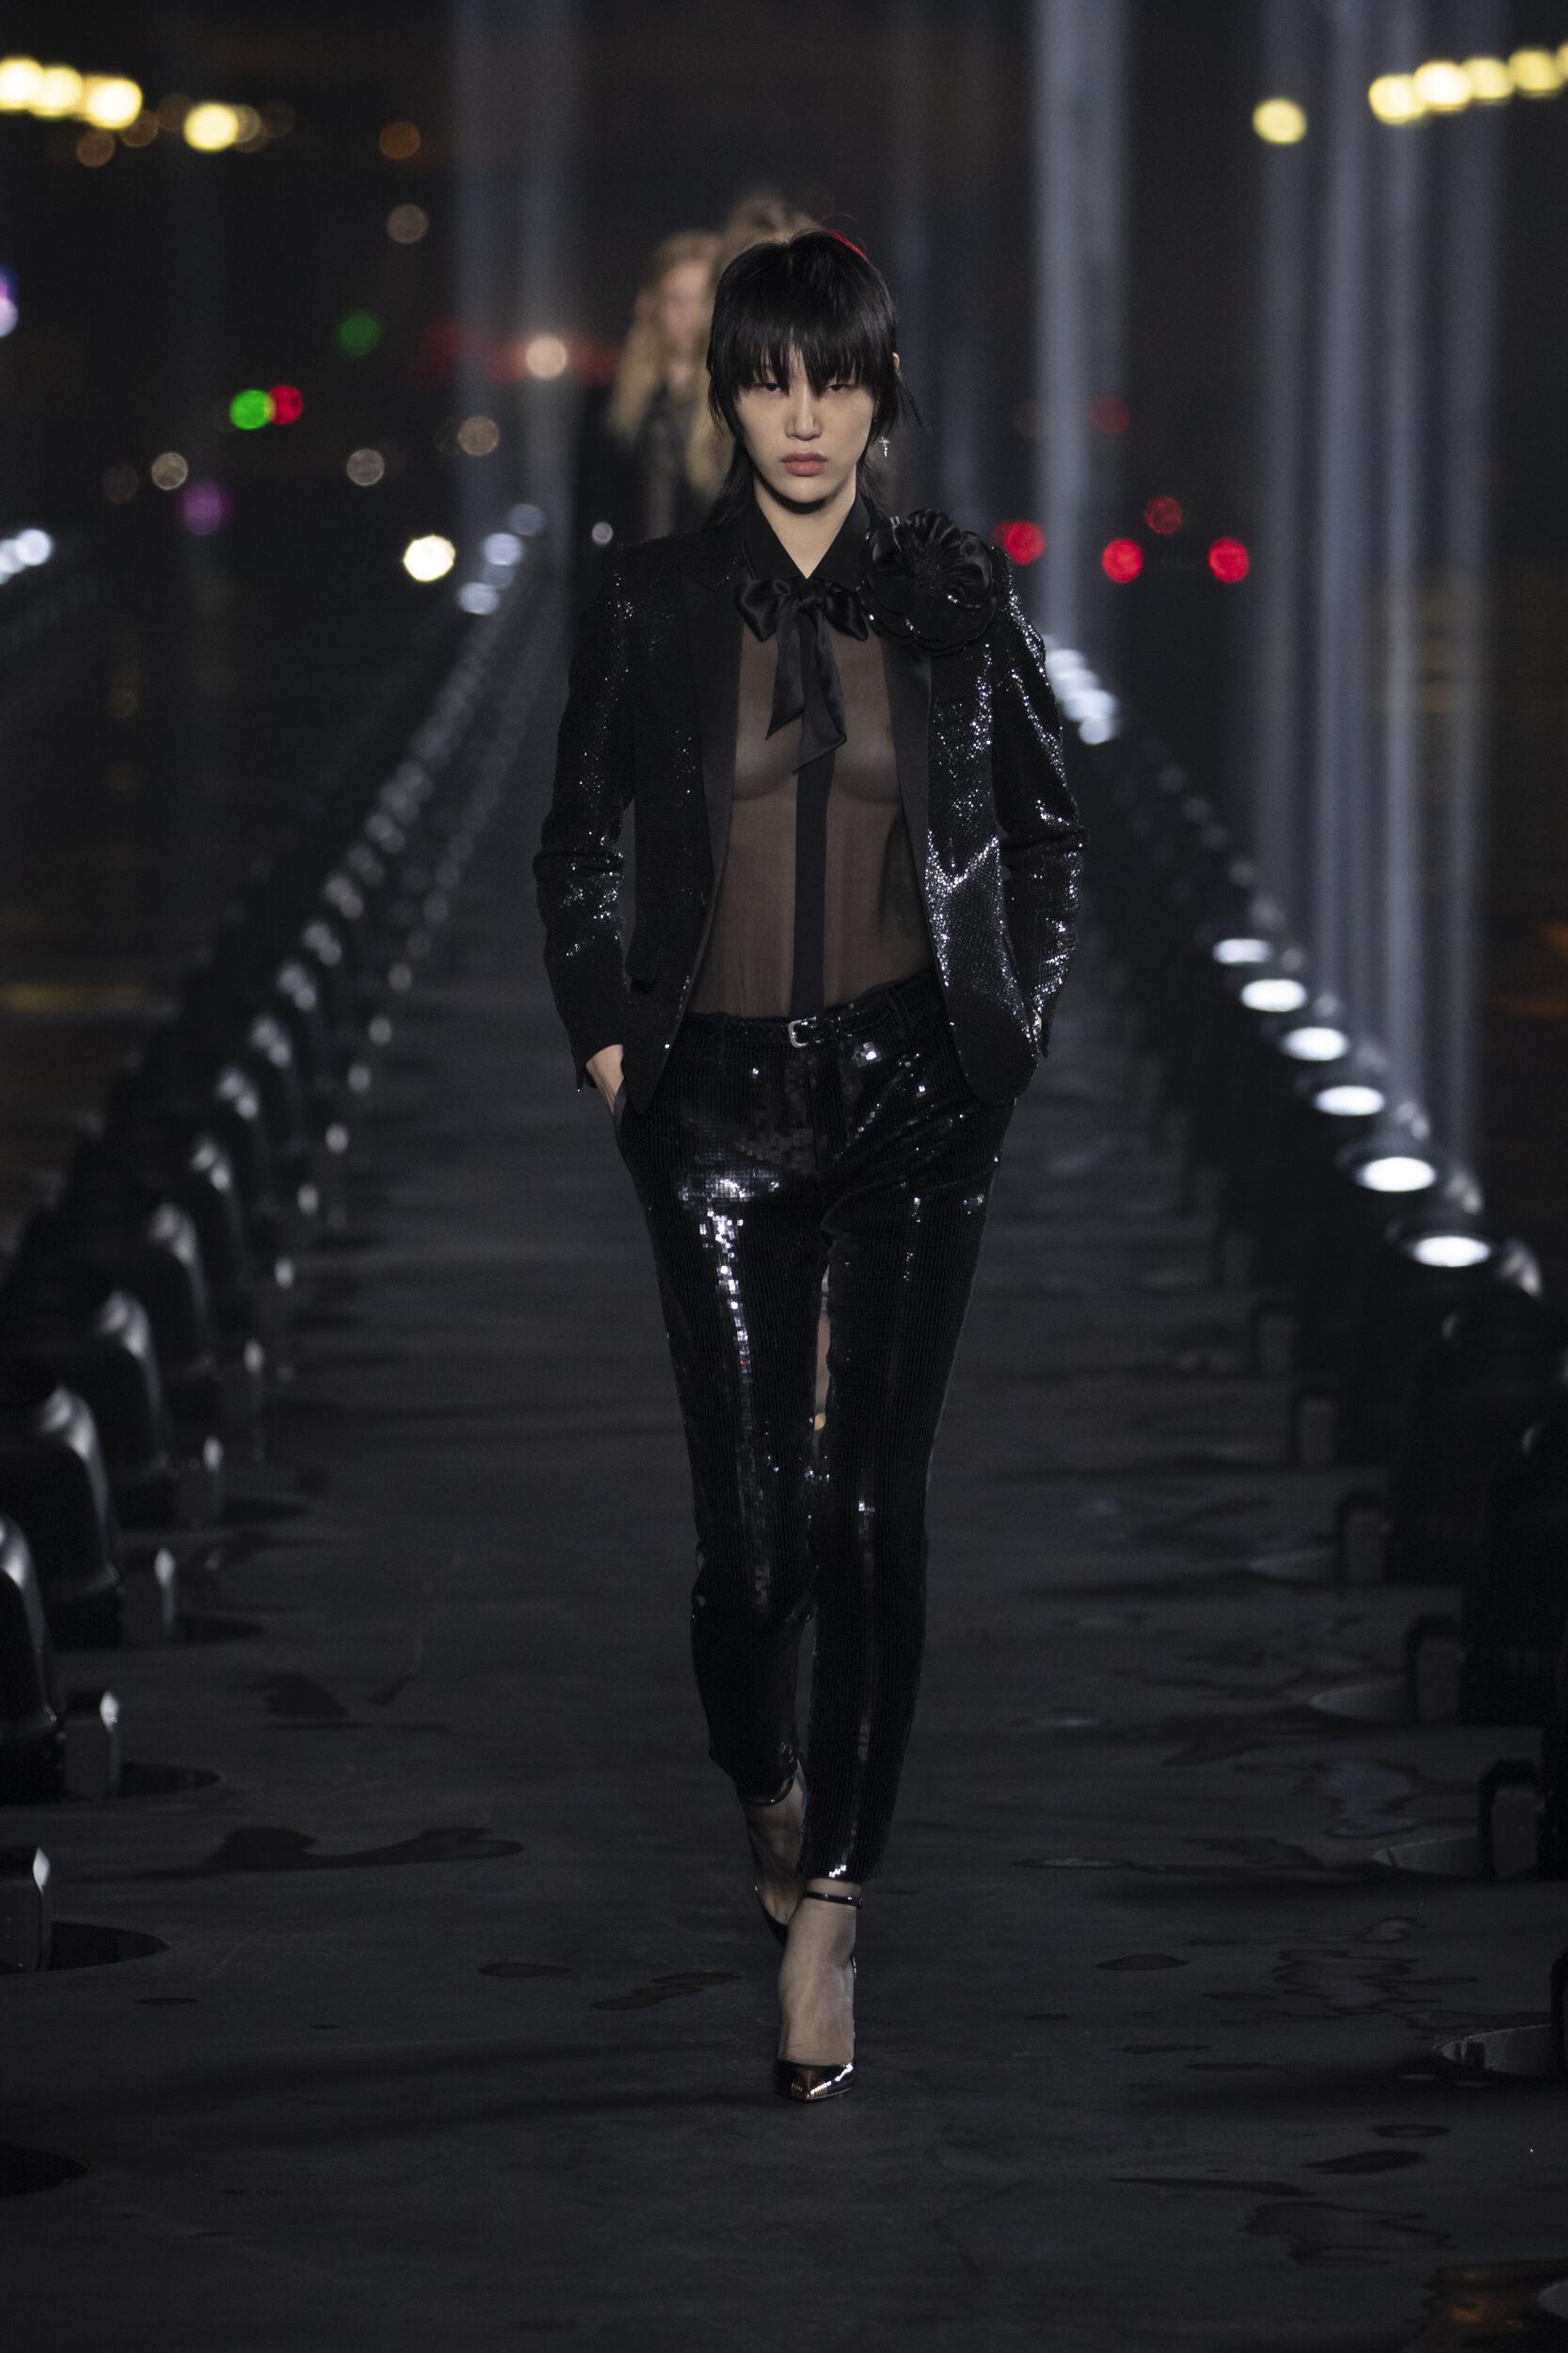 Fashion 2020 Runway Saint Laurent Summer Woman